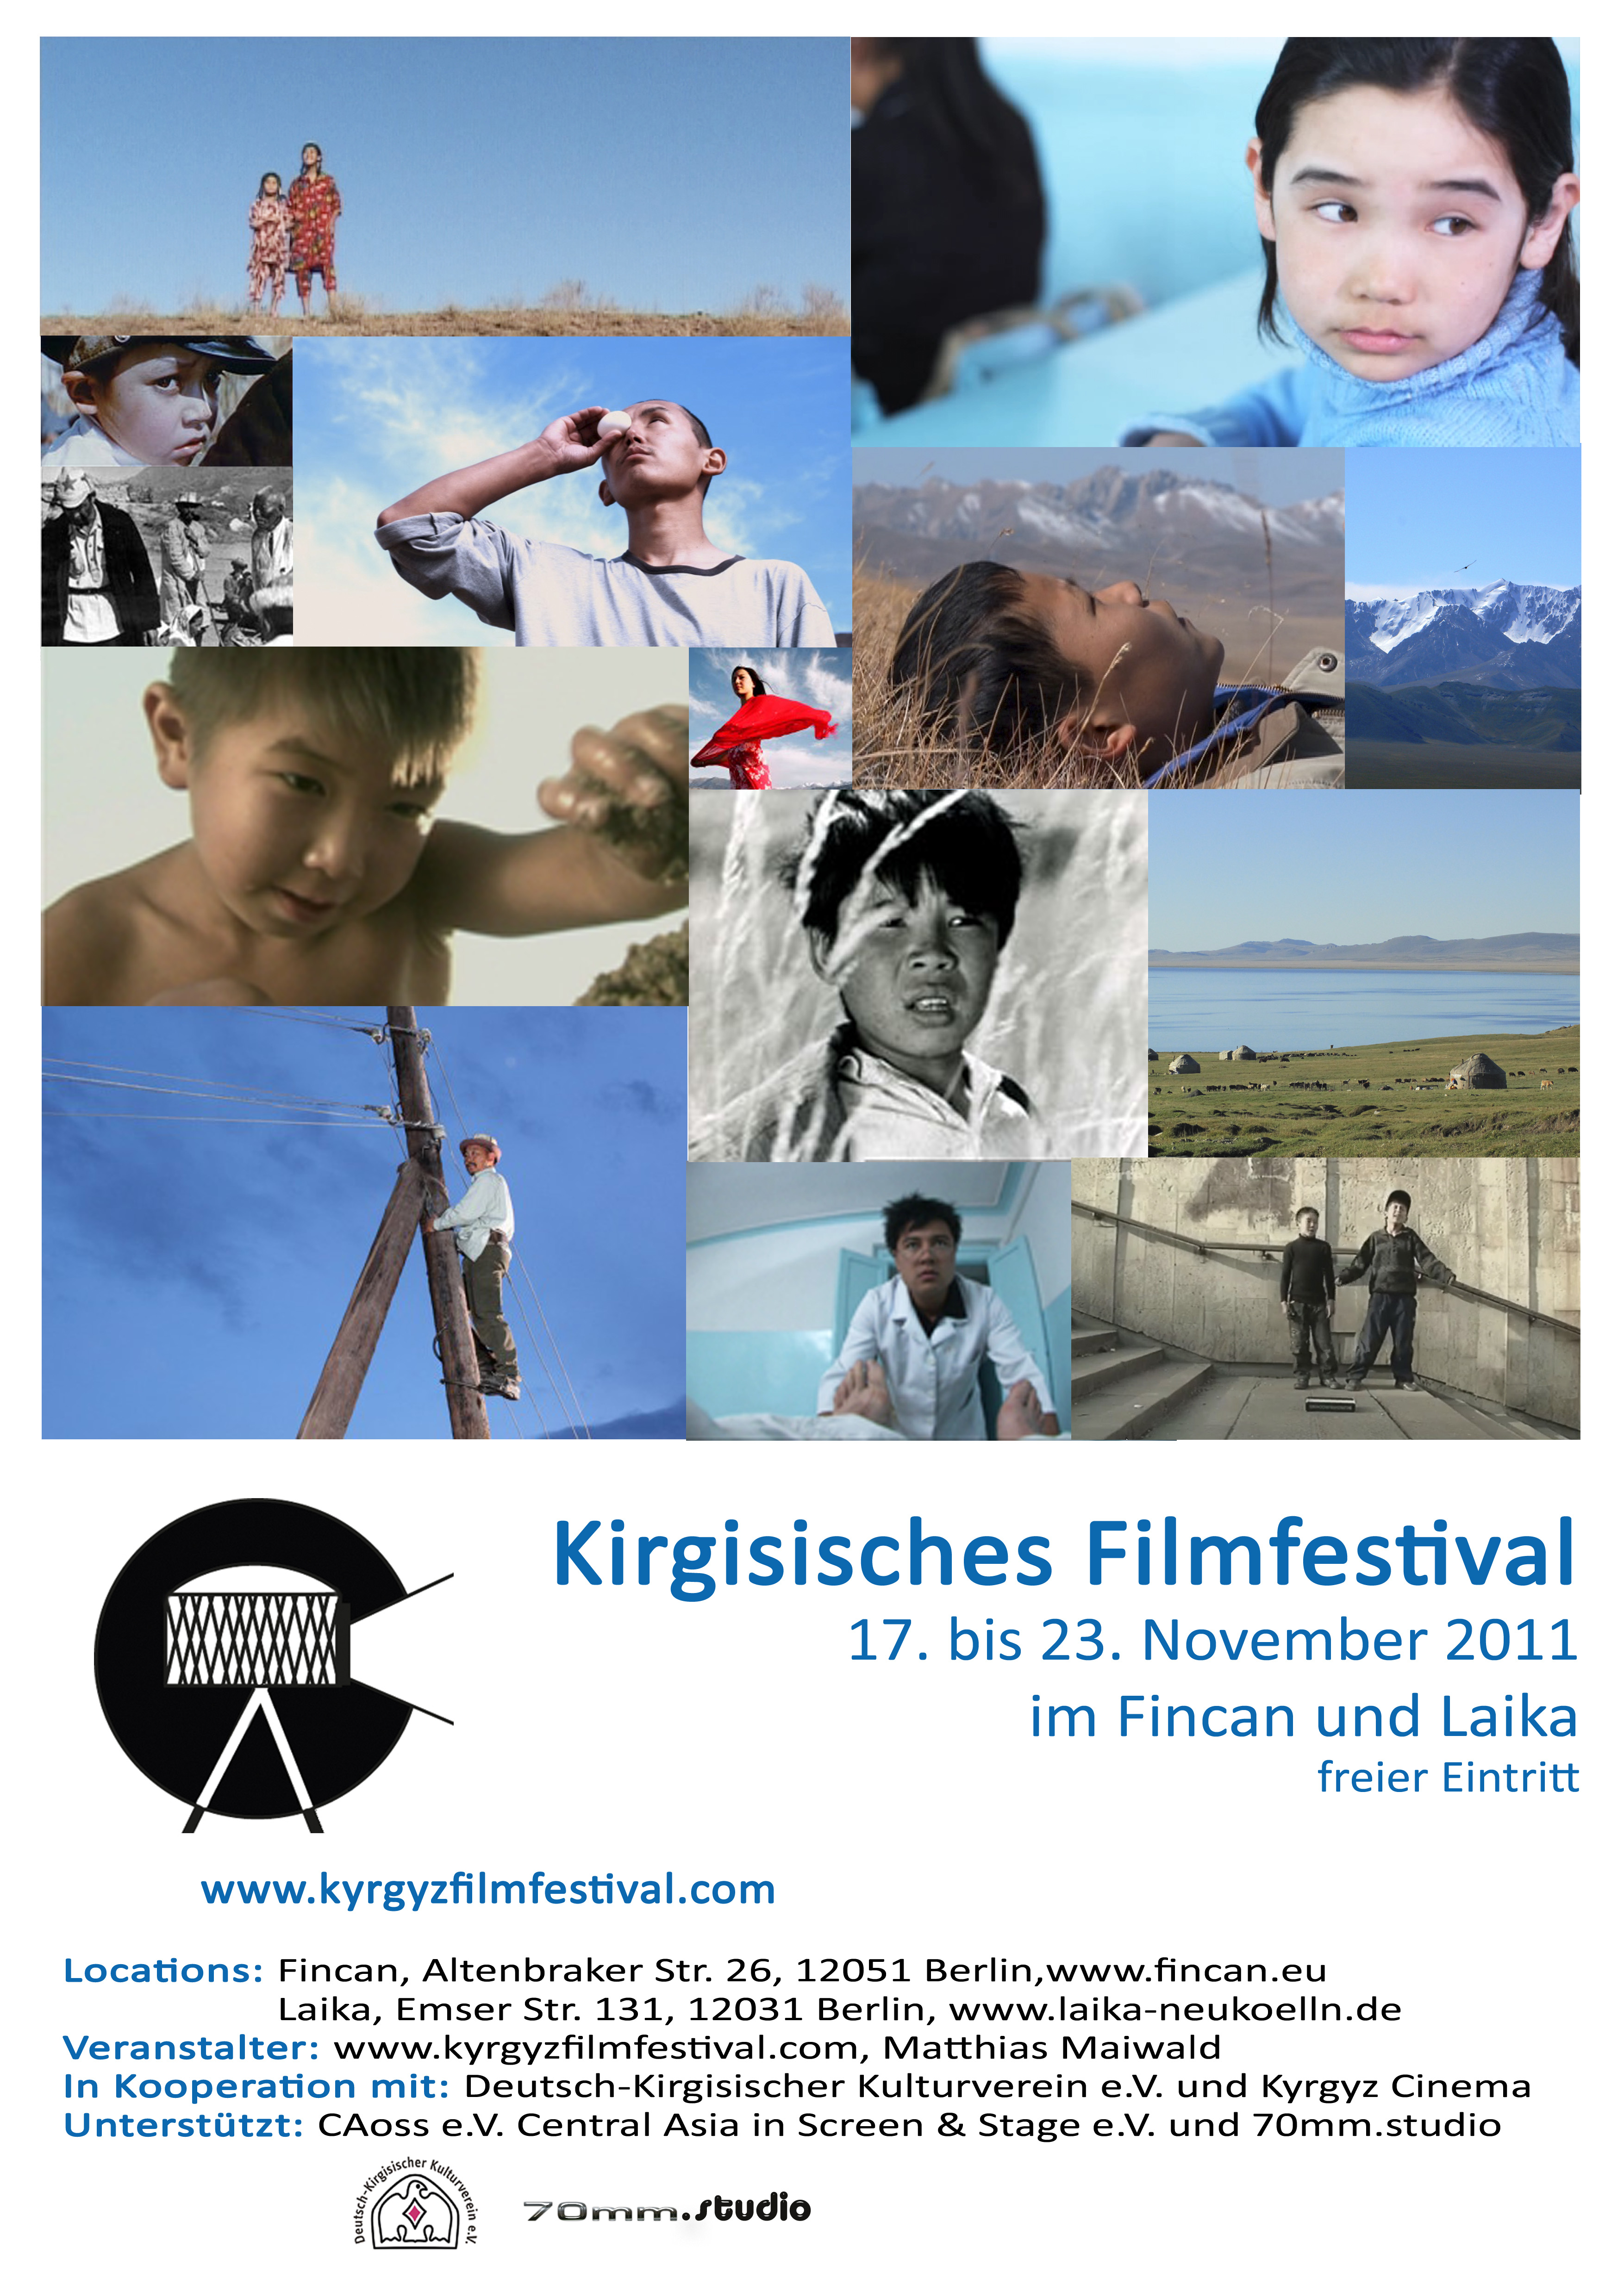 plakat_kirgfilmfest